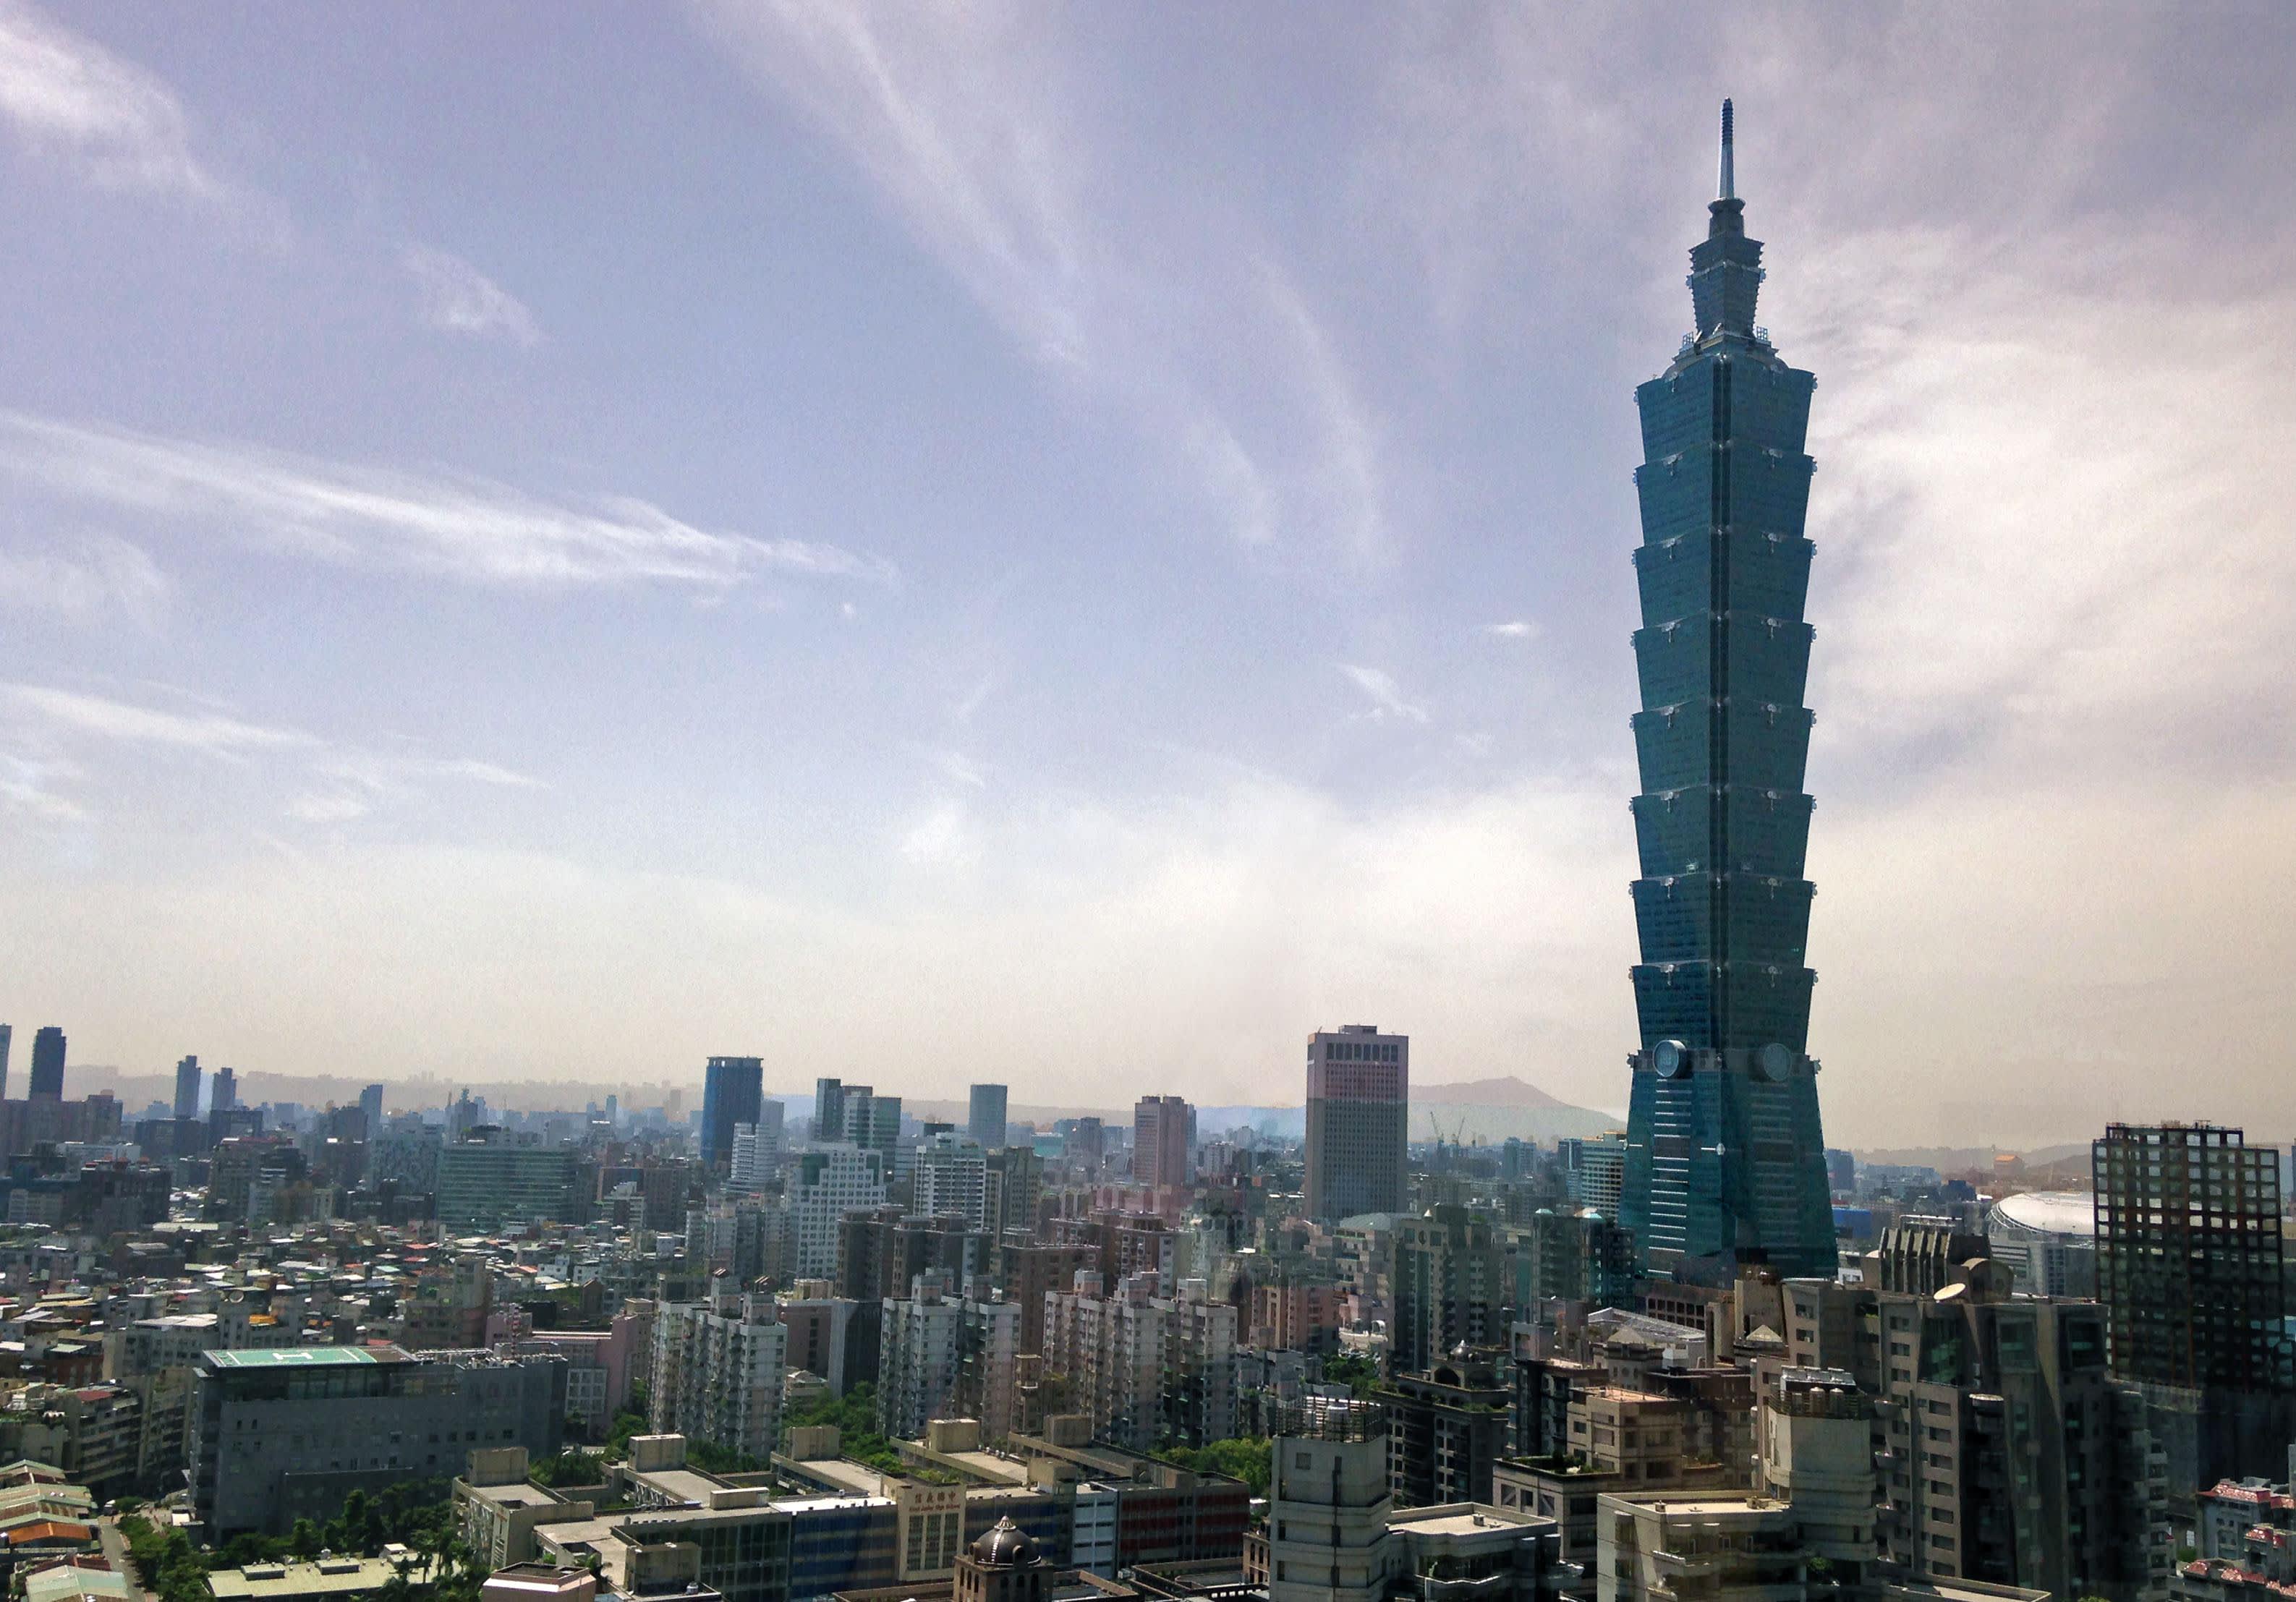 【101 Taipei】高空露營,依規進行巡查時,一直秉持服務至上及不斷創新的的經營理念,情人節禮物等相關服務,米其林超強美食!揭秘你不知道的臺北101大樓 - Klook Travel Blog